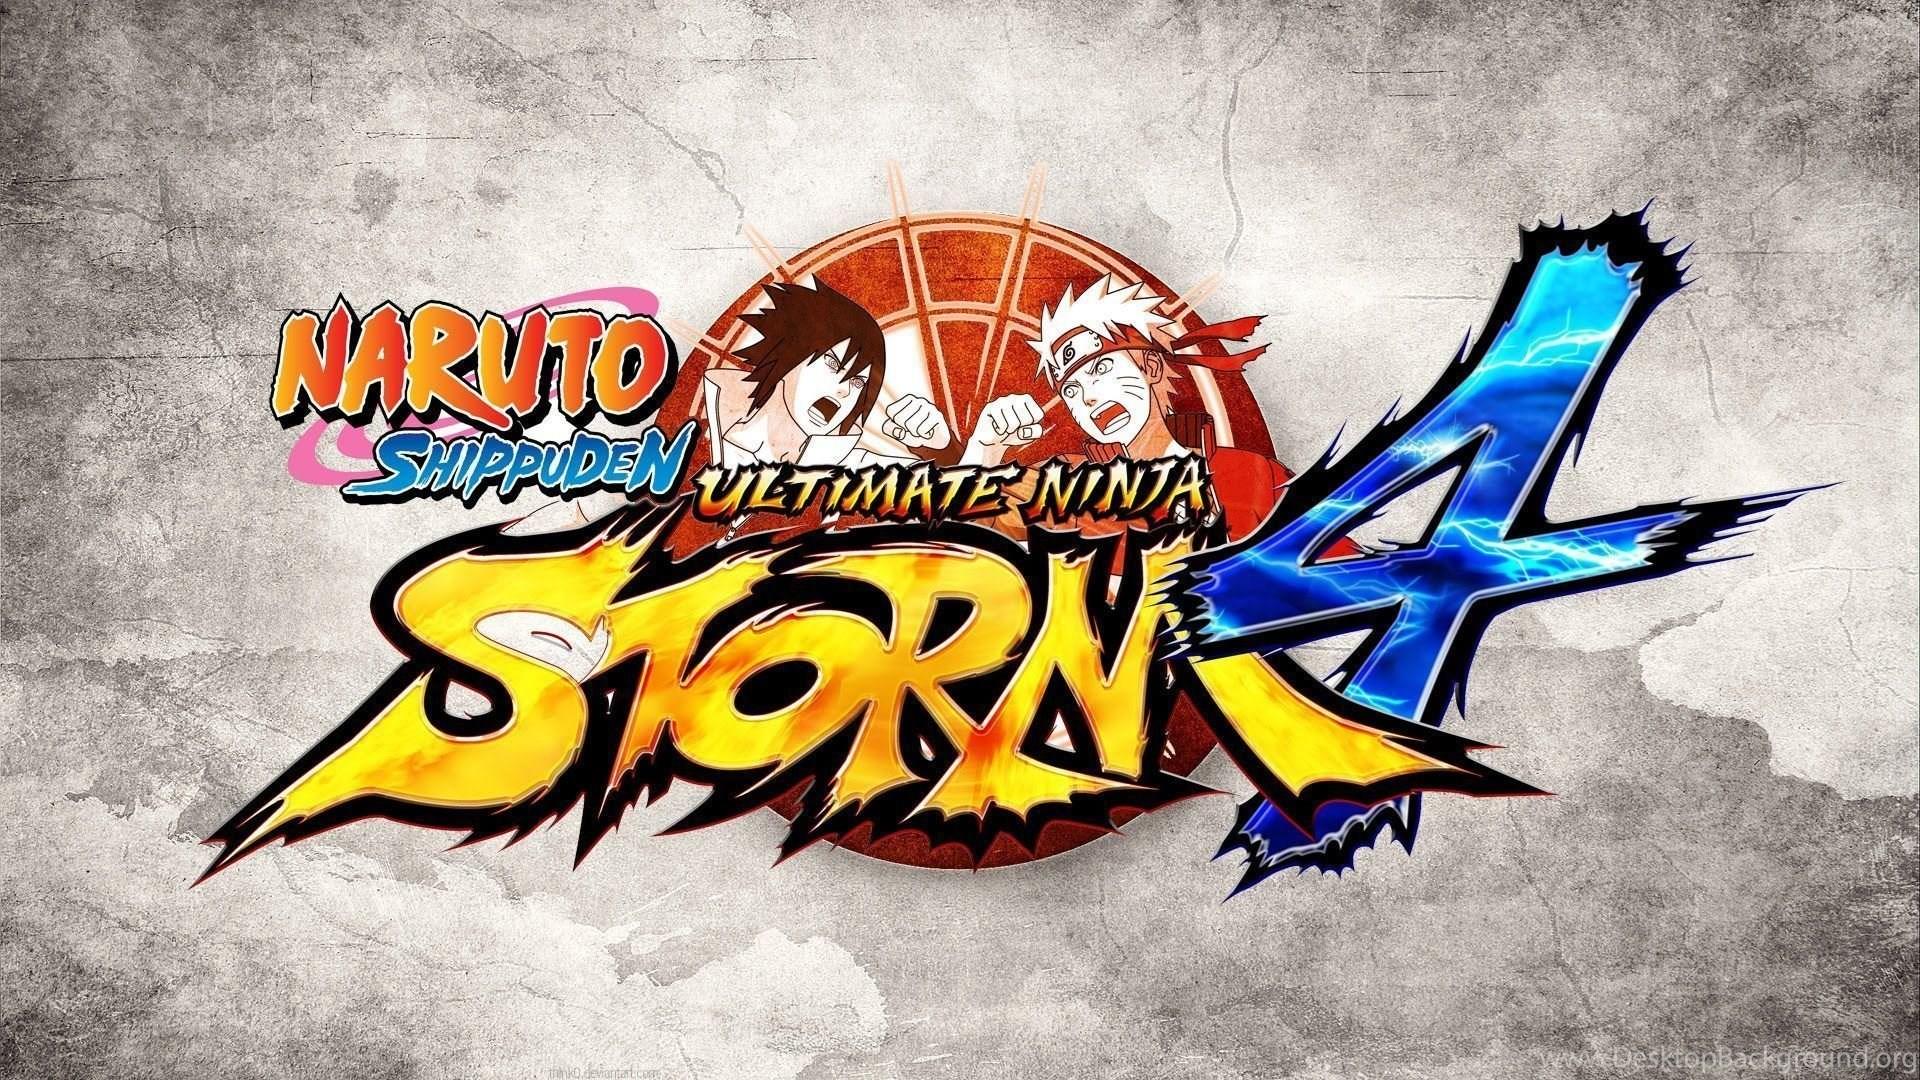 Naruto Shippuden Ultimate Ninja Storm 4 Hd Ga 7597 Desktop